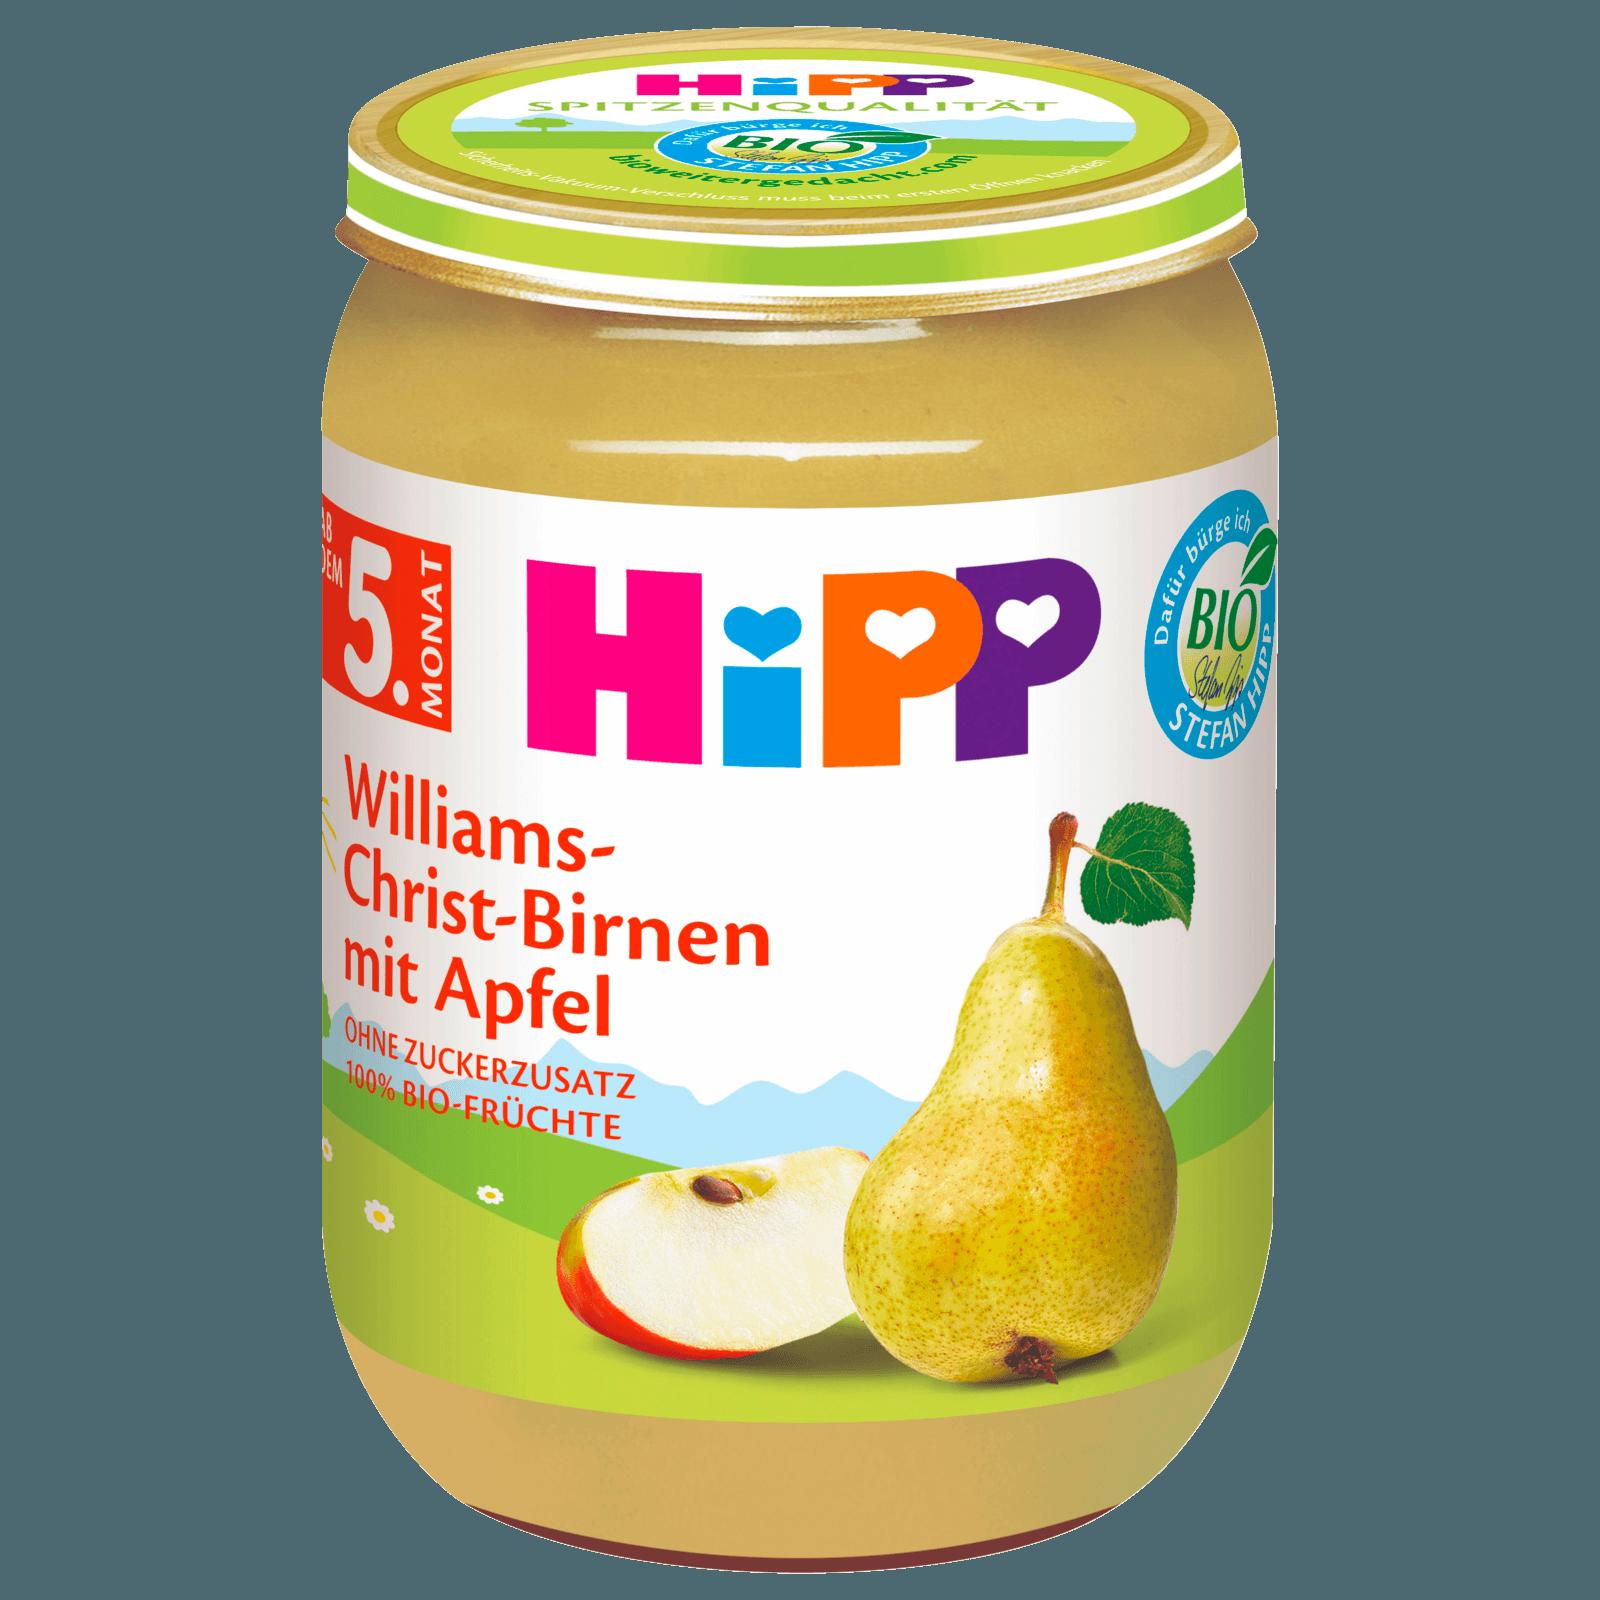 Hipp Williams-Christ-Birnen 190g